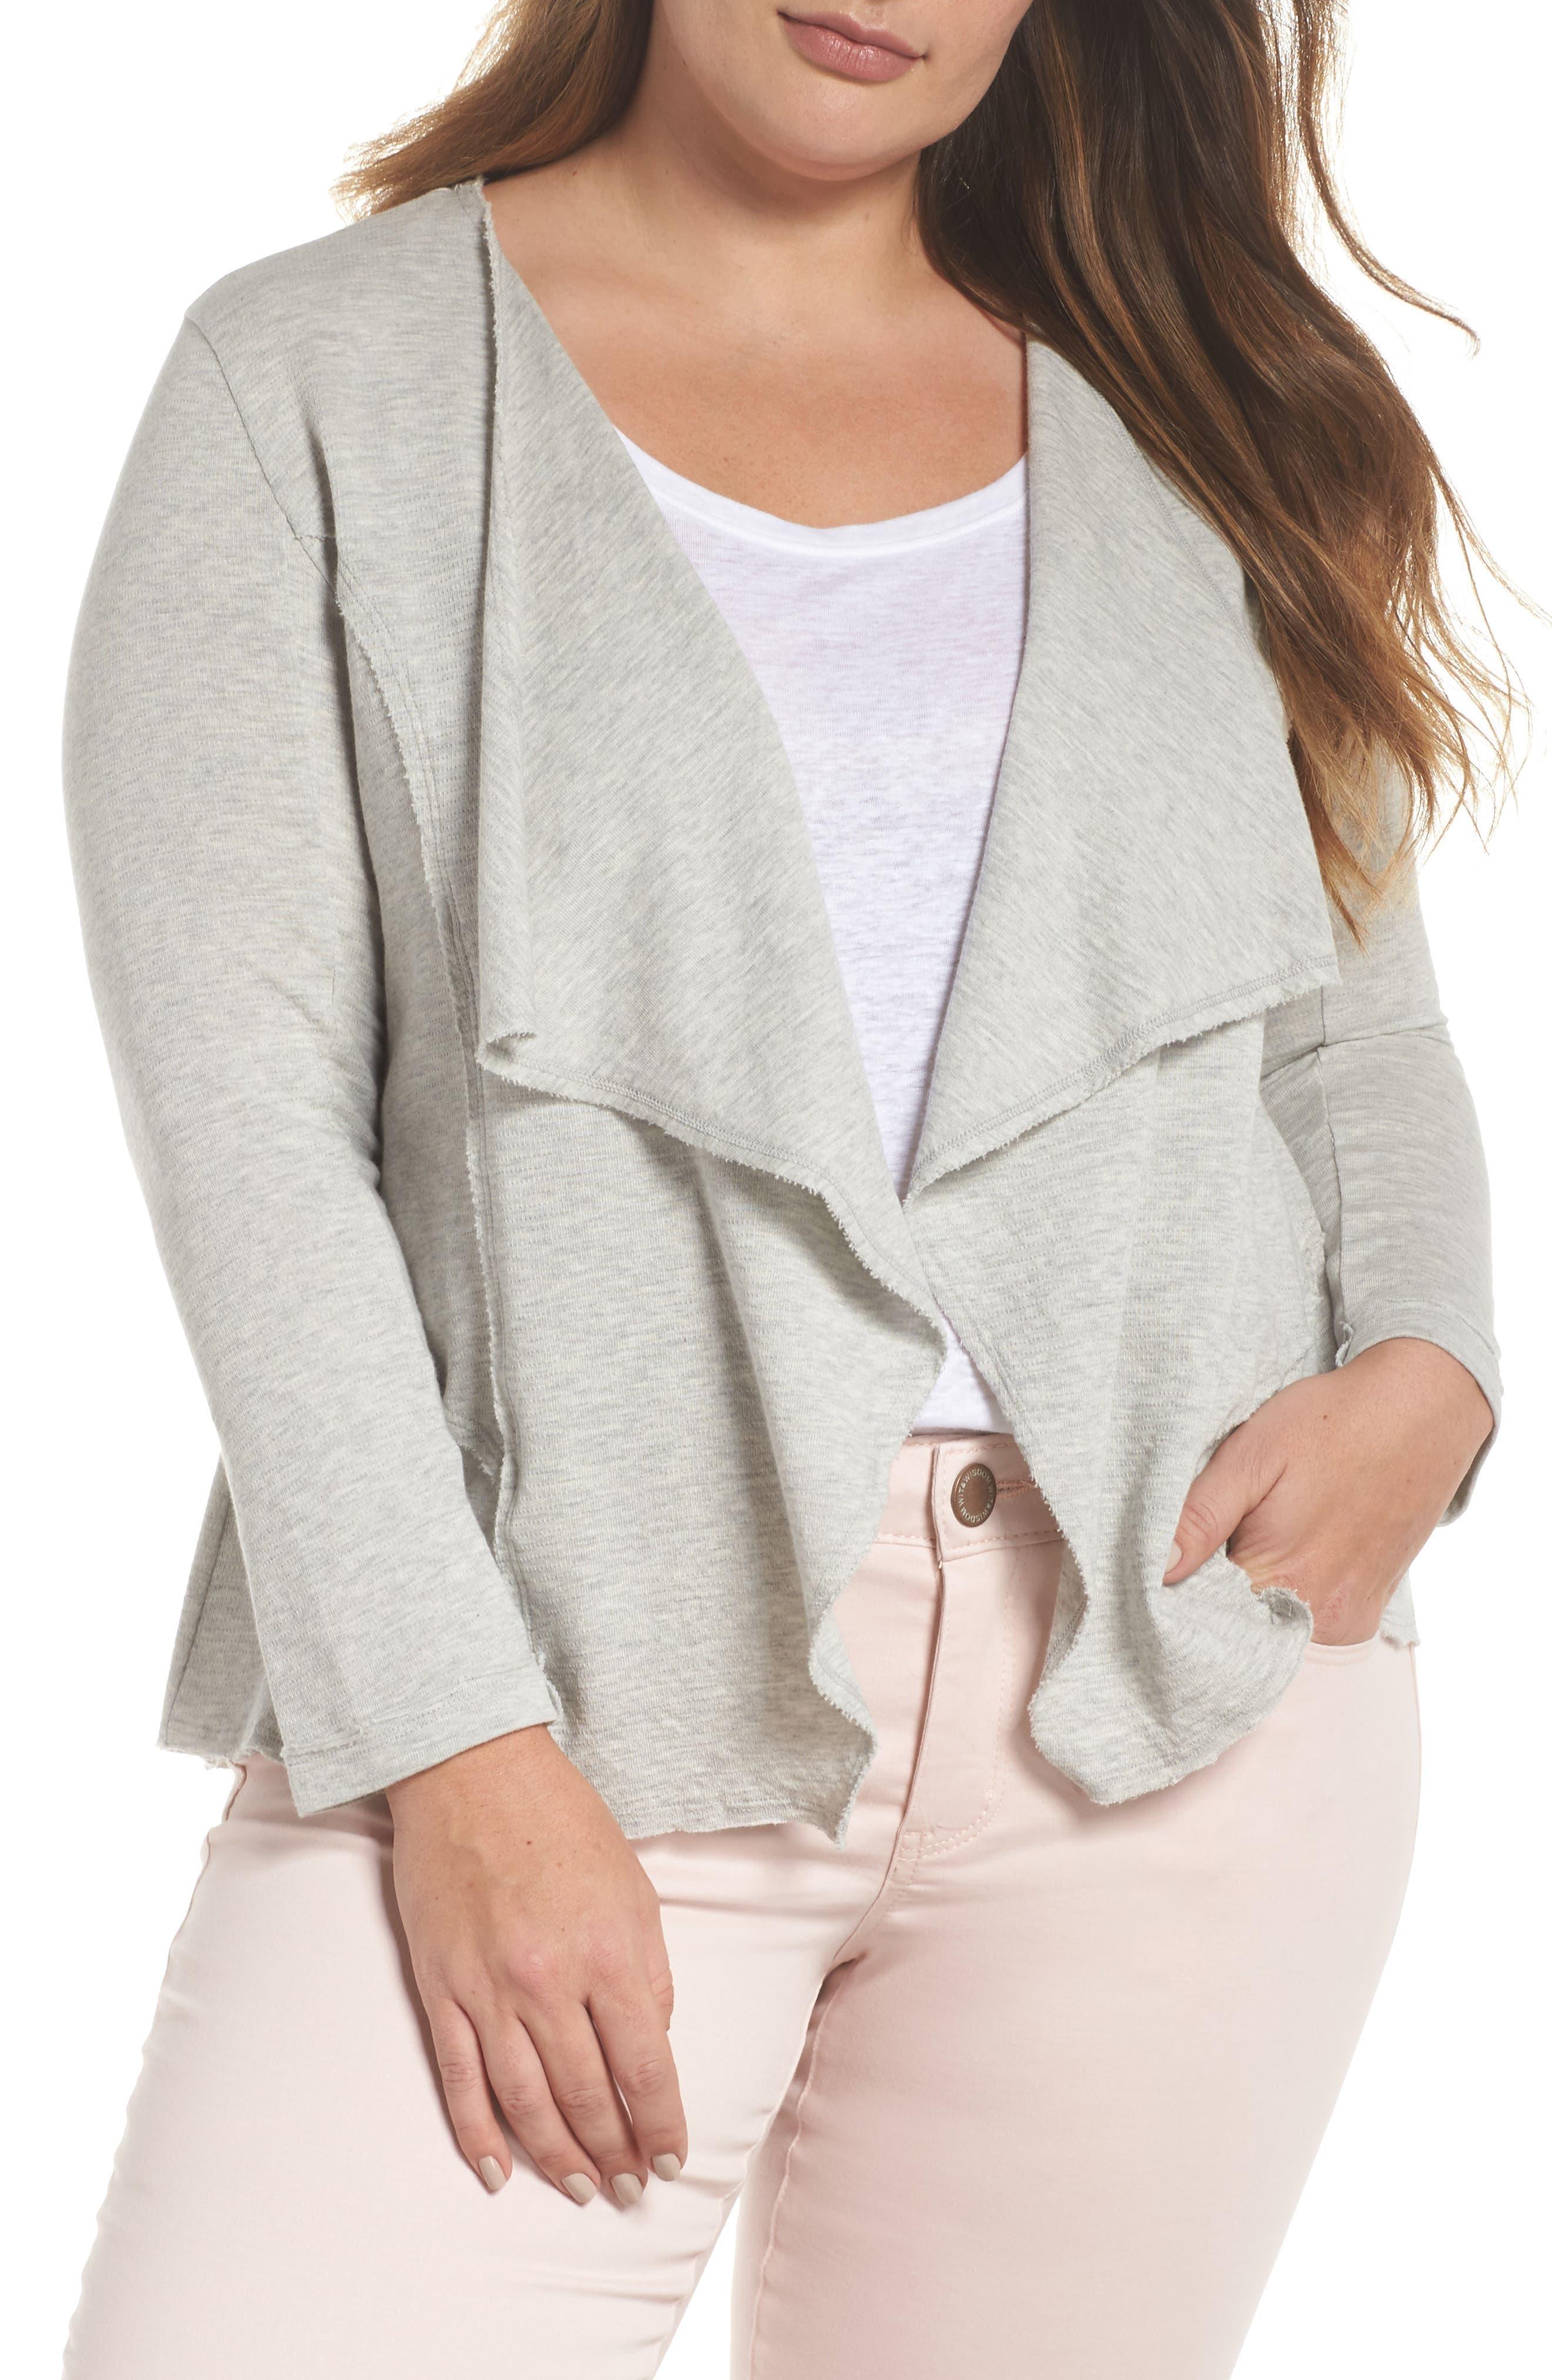 Alternate Image 1 Selected - Caslon® Knit Drape Jacket (Plus Size)